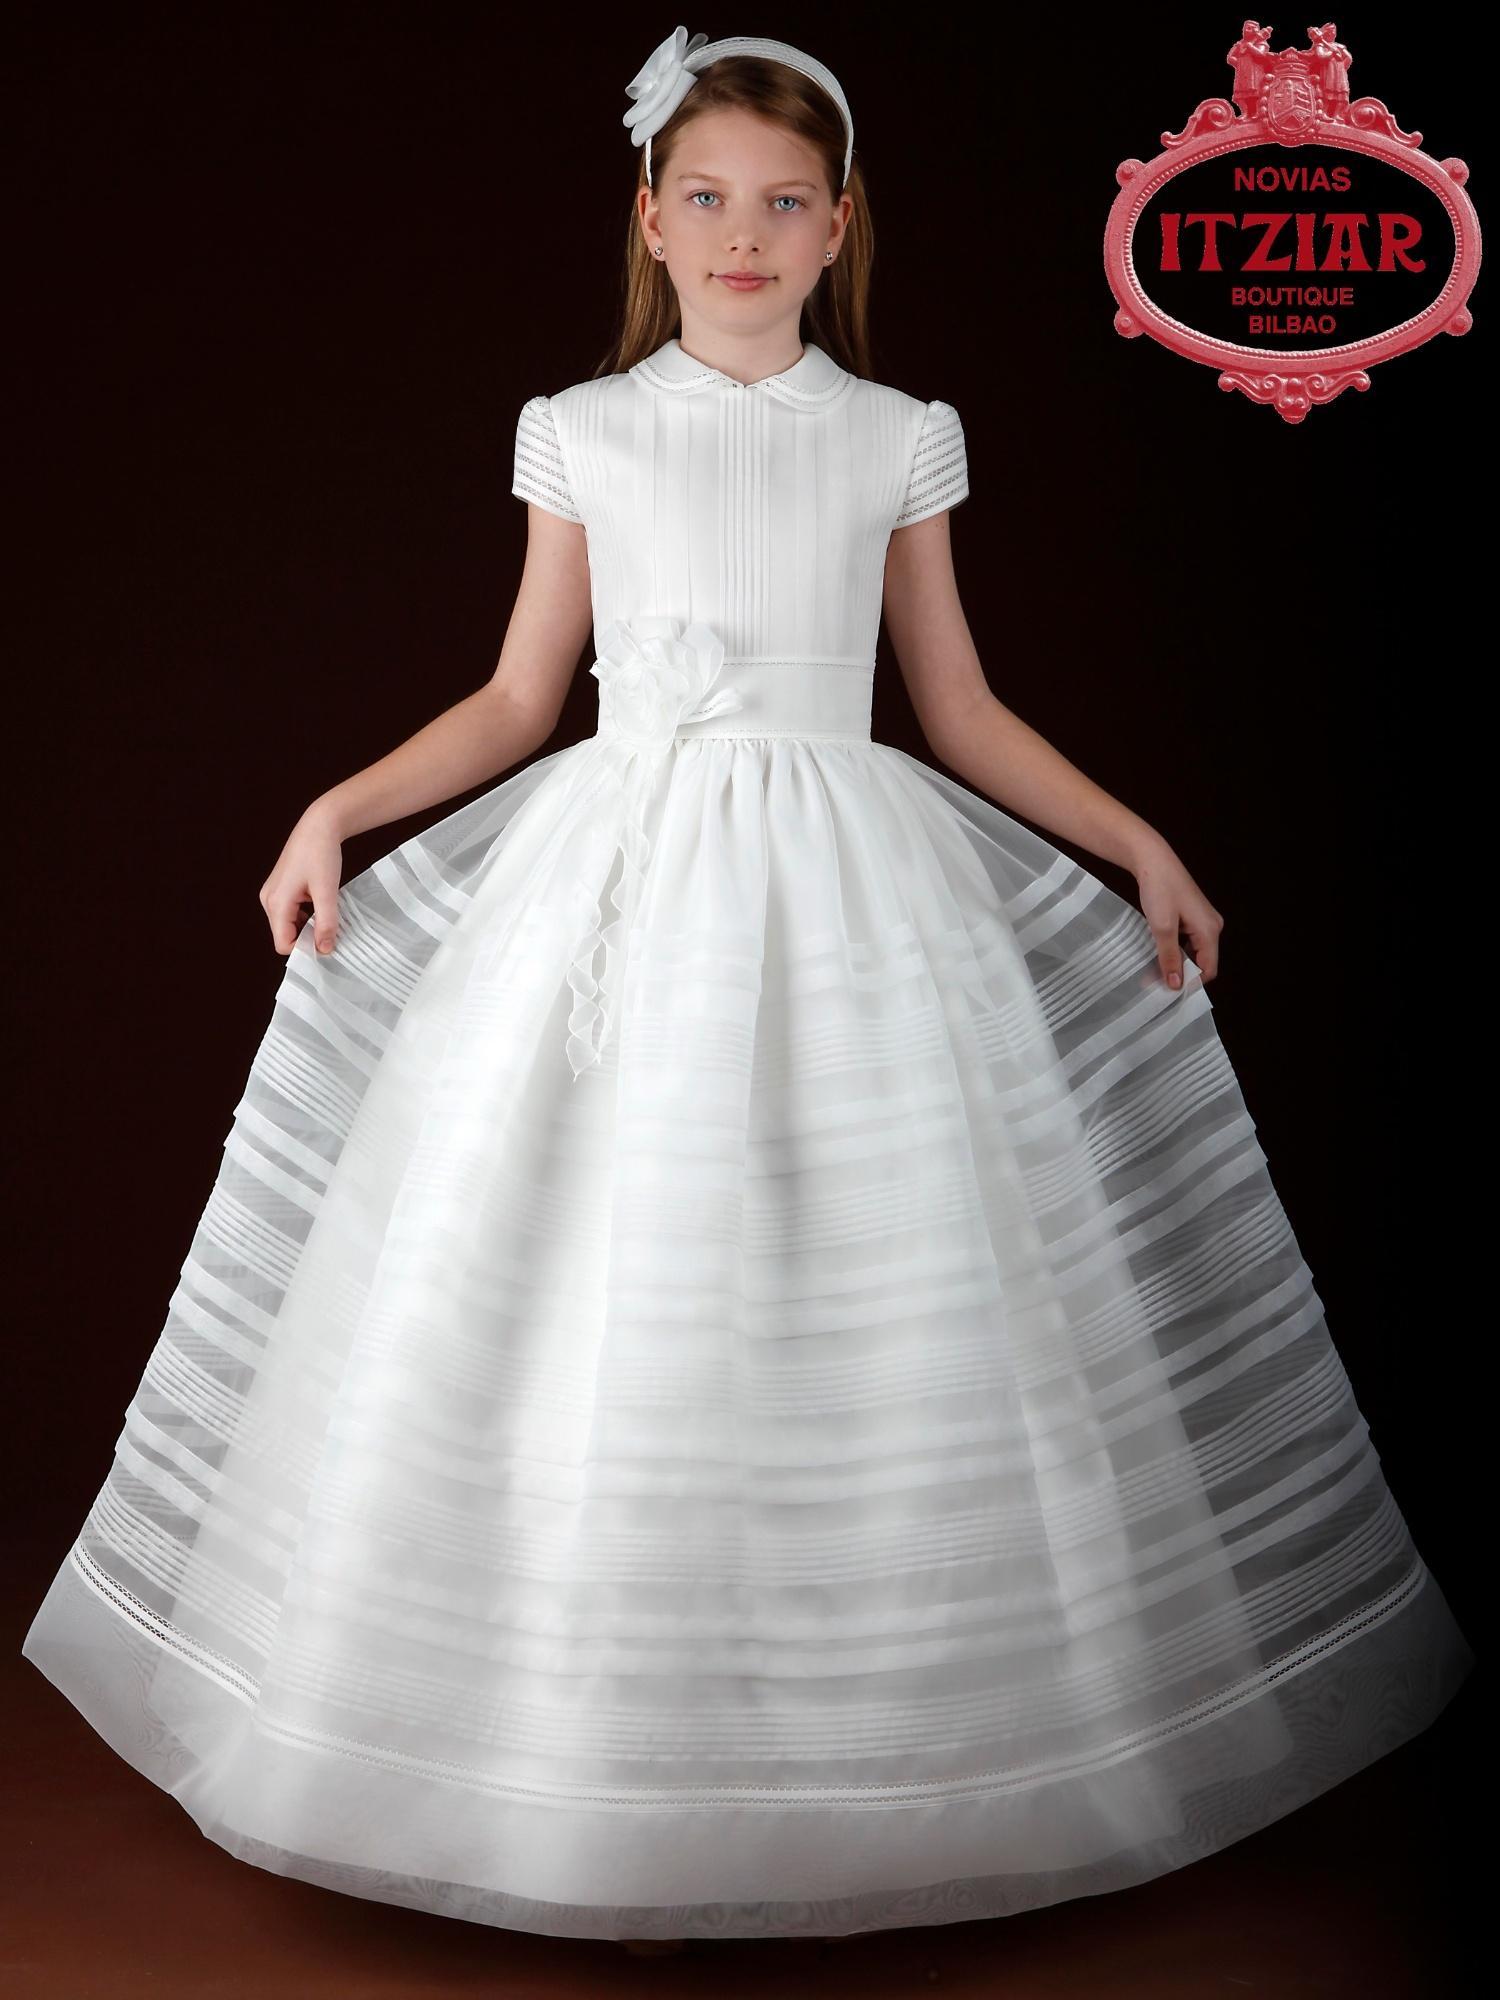 Vestidos de comunion itziar bilbao